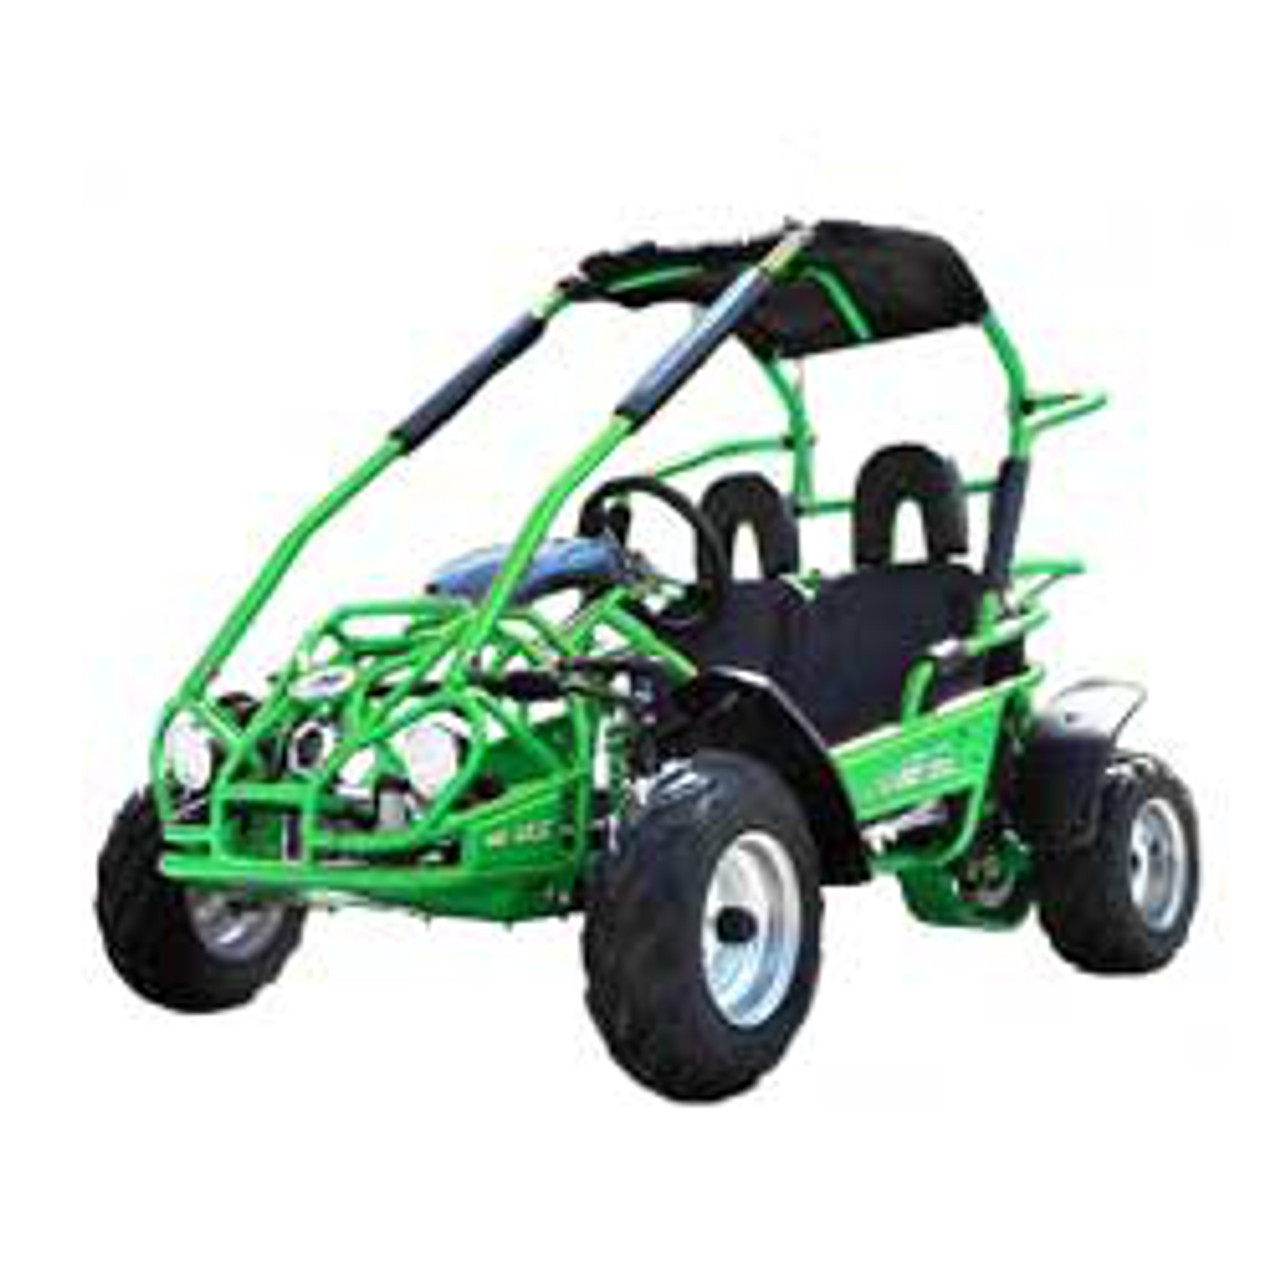 TrailMaster Mid XRX Go-Kart - Green